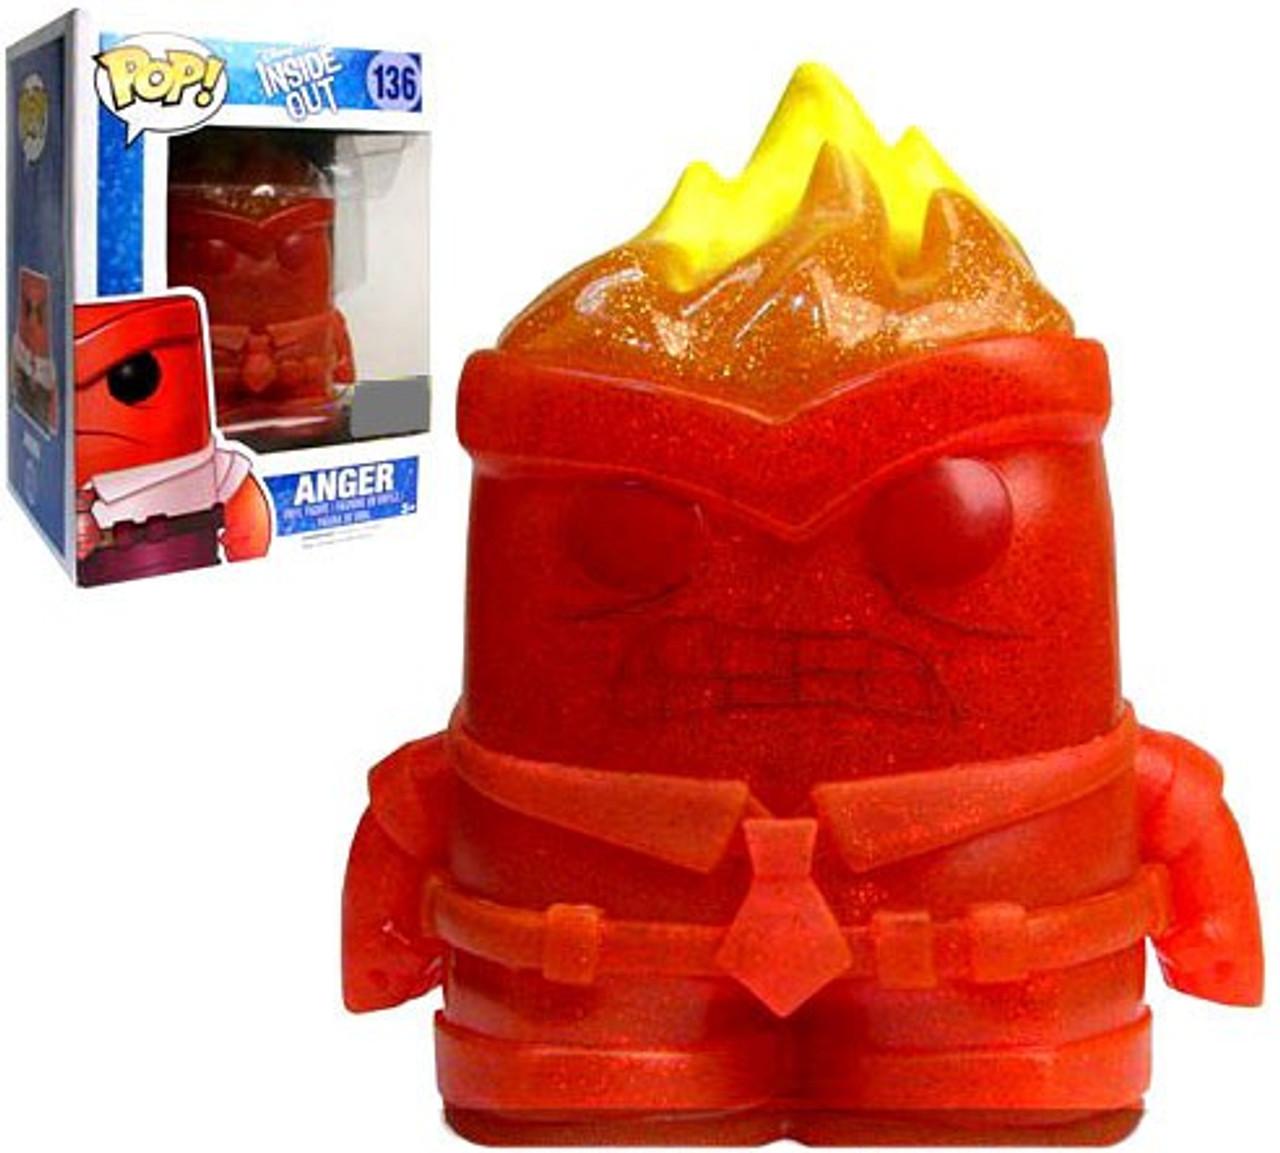 Disney / Pixar Inside Out Funko POP! Disney Anger Exclusive Vinyl Figure  #136 [Crystal]